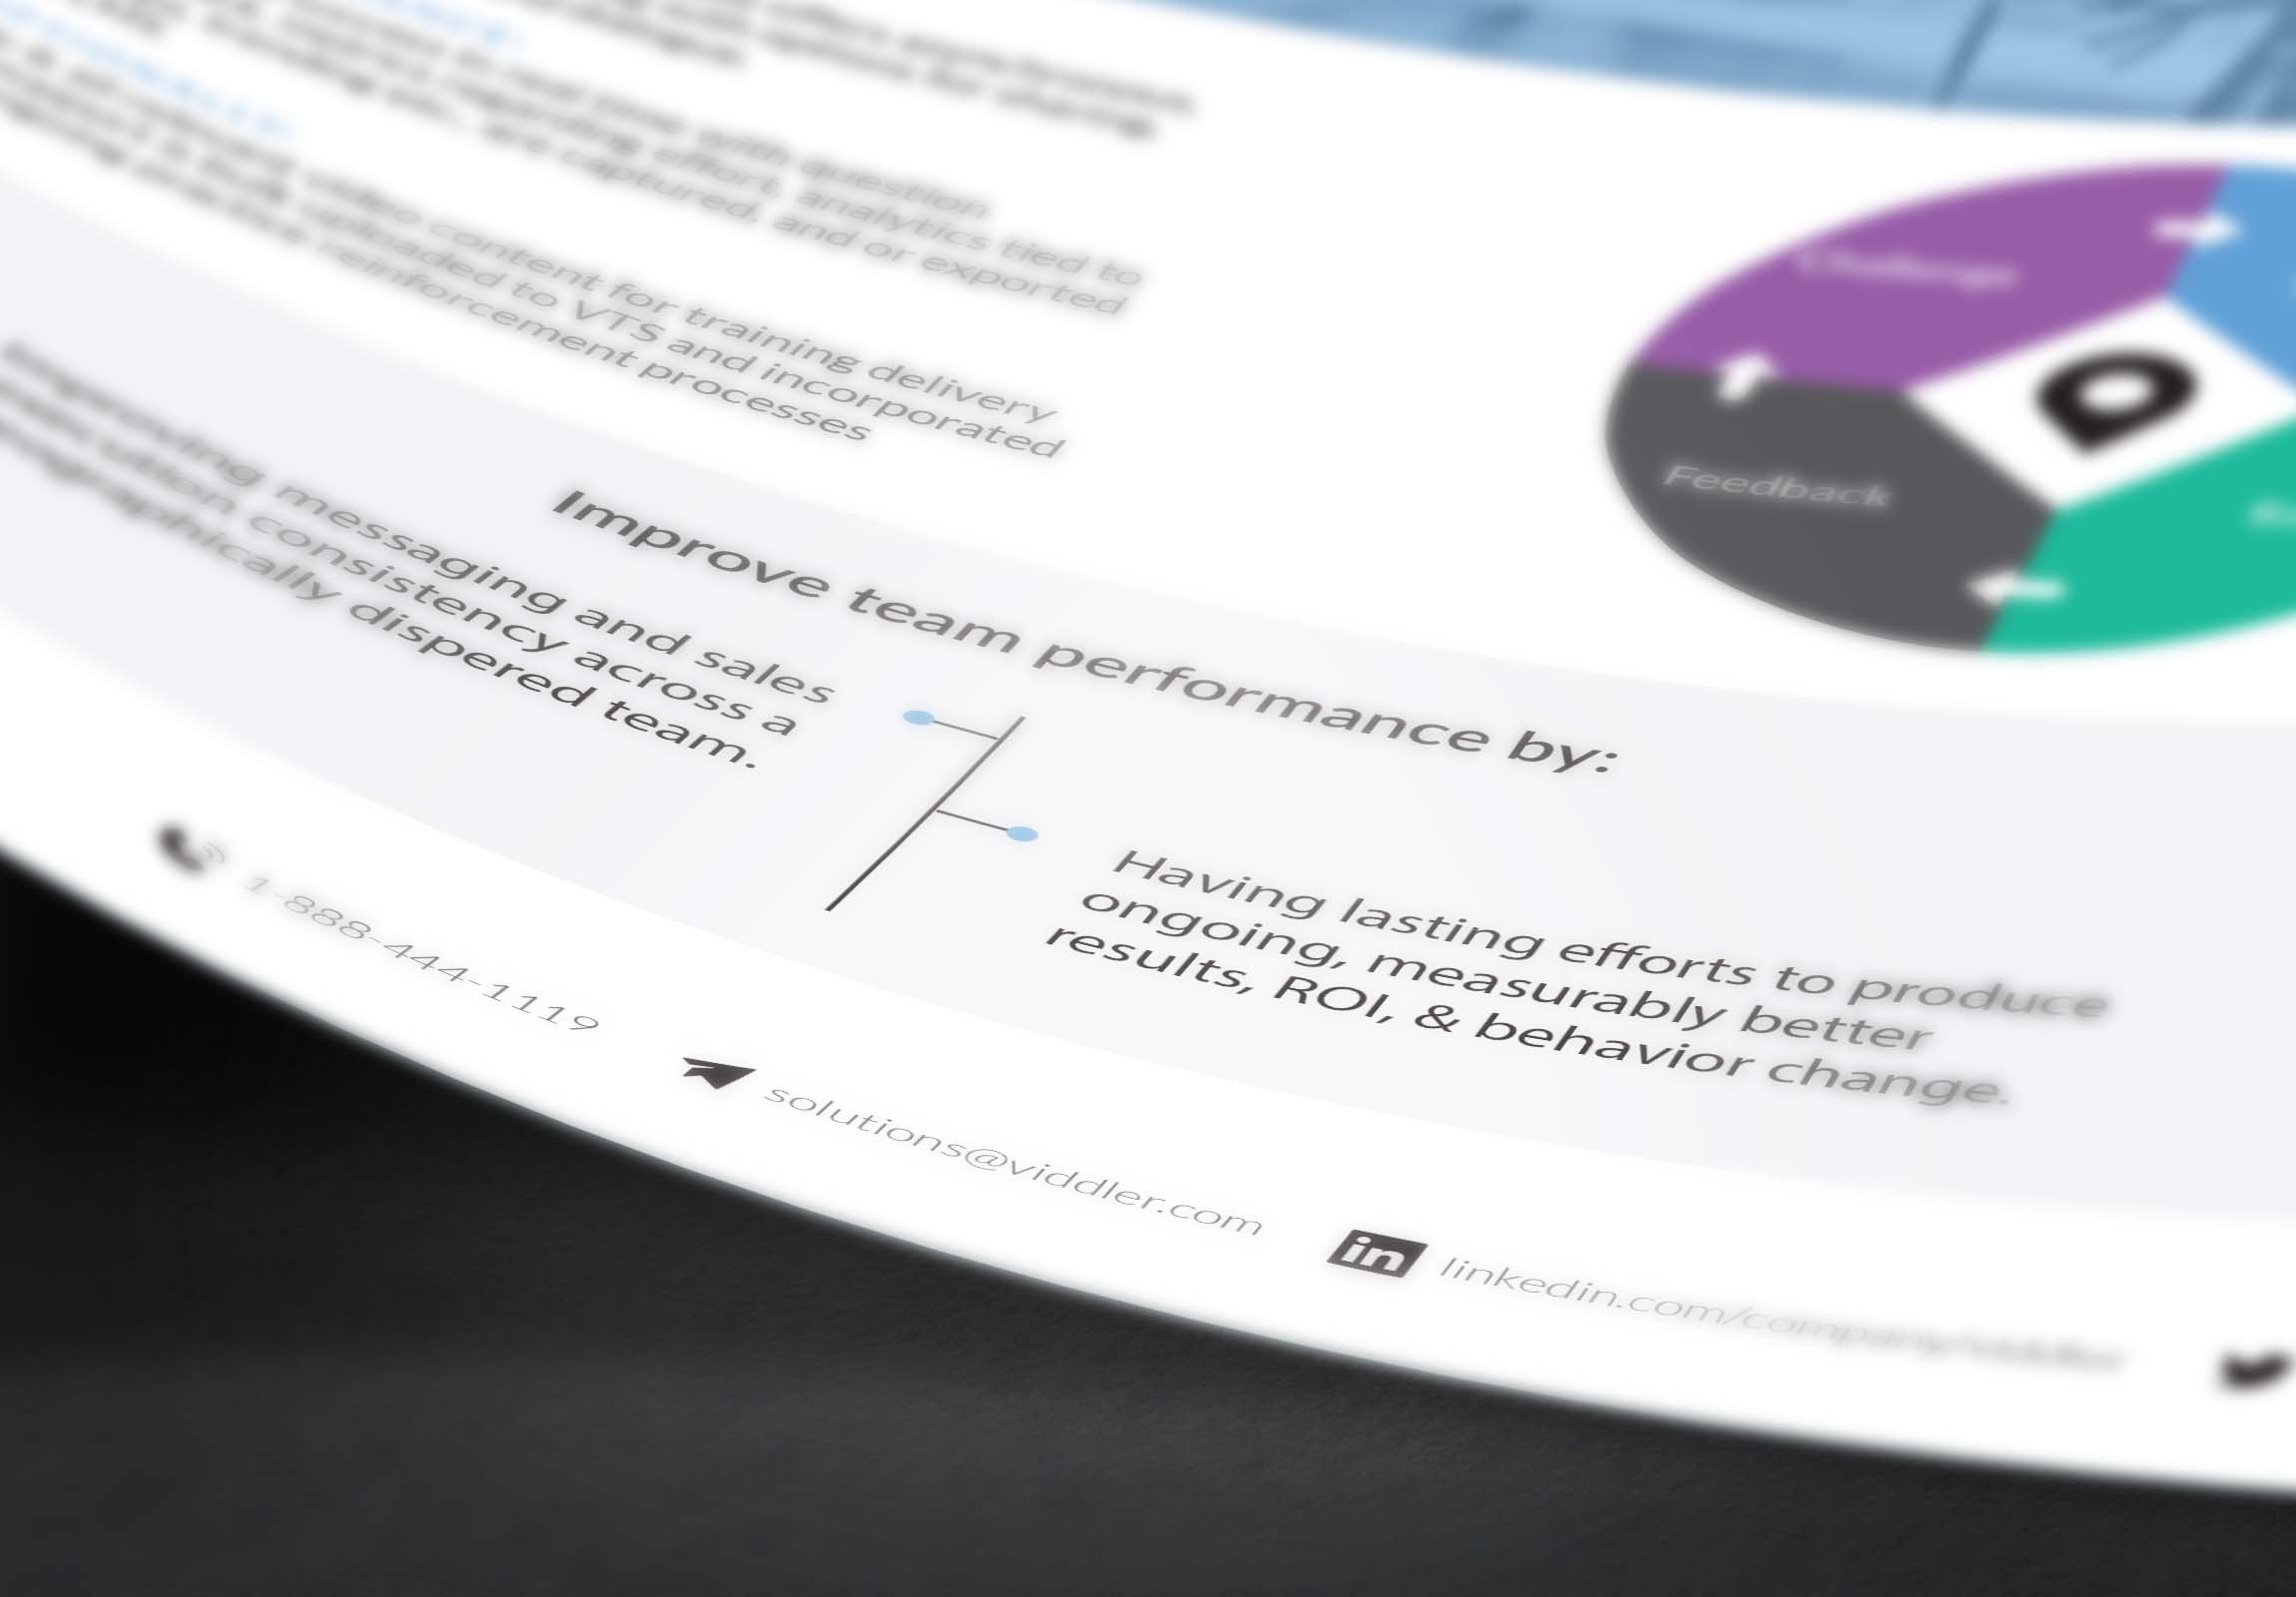 Viddler PDF - Sales Performance & Skills Improvement.jpg